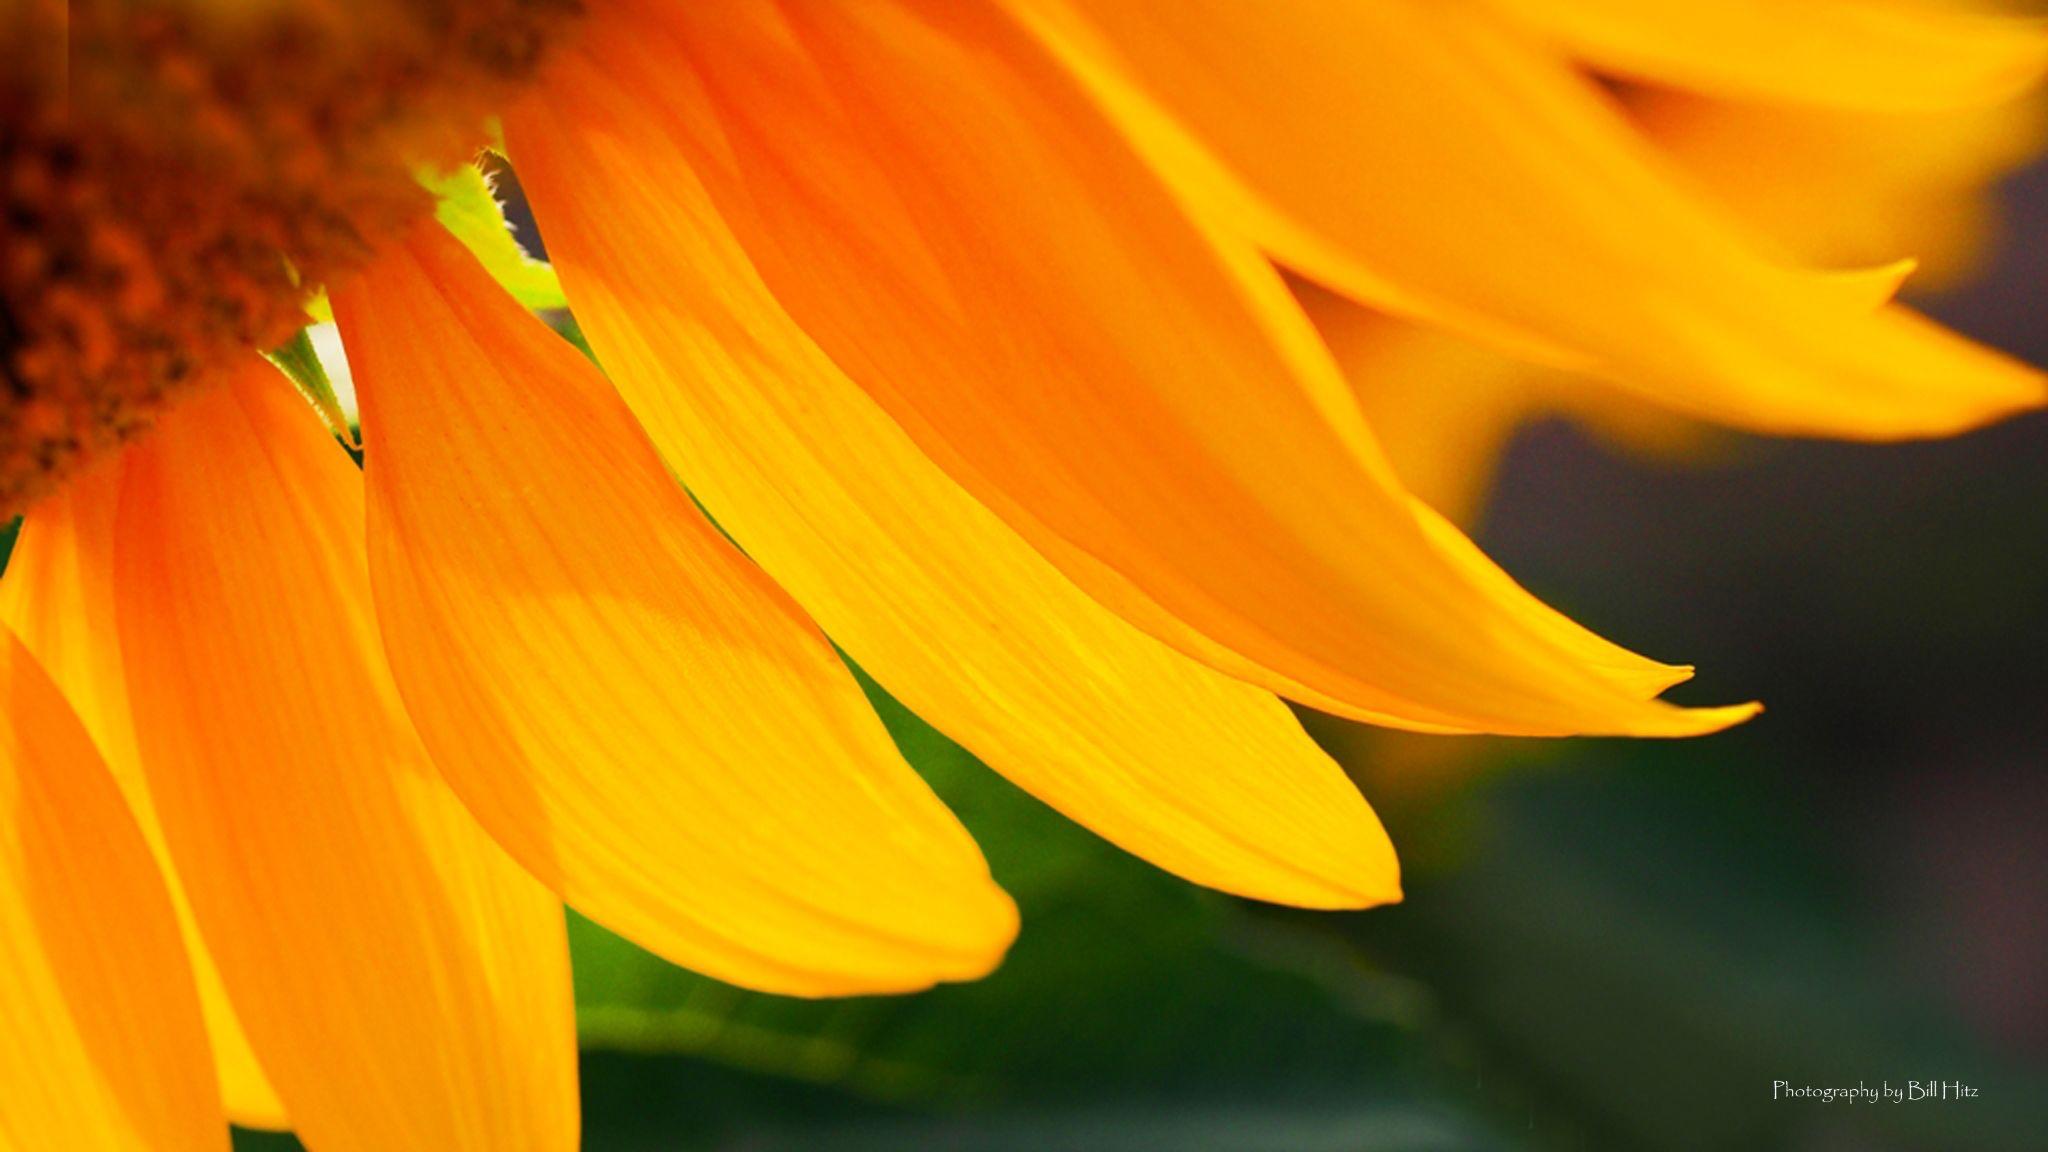 Sun Flower by Bill Hitz